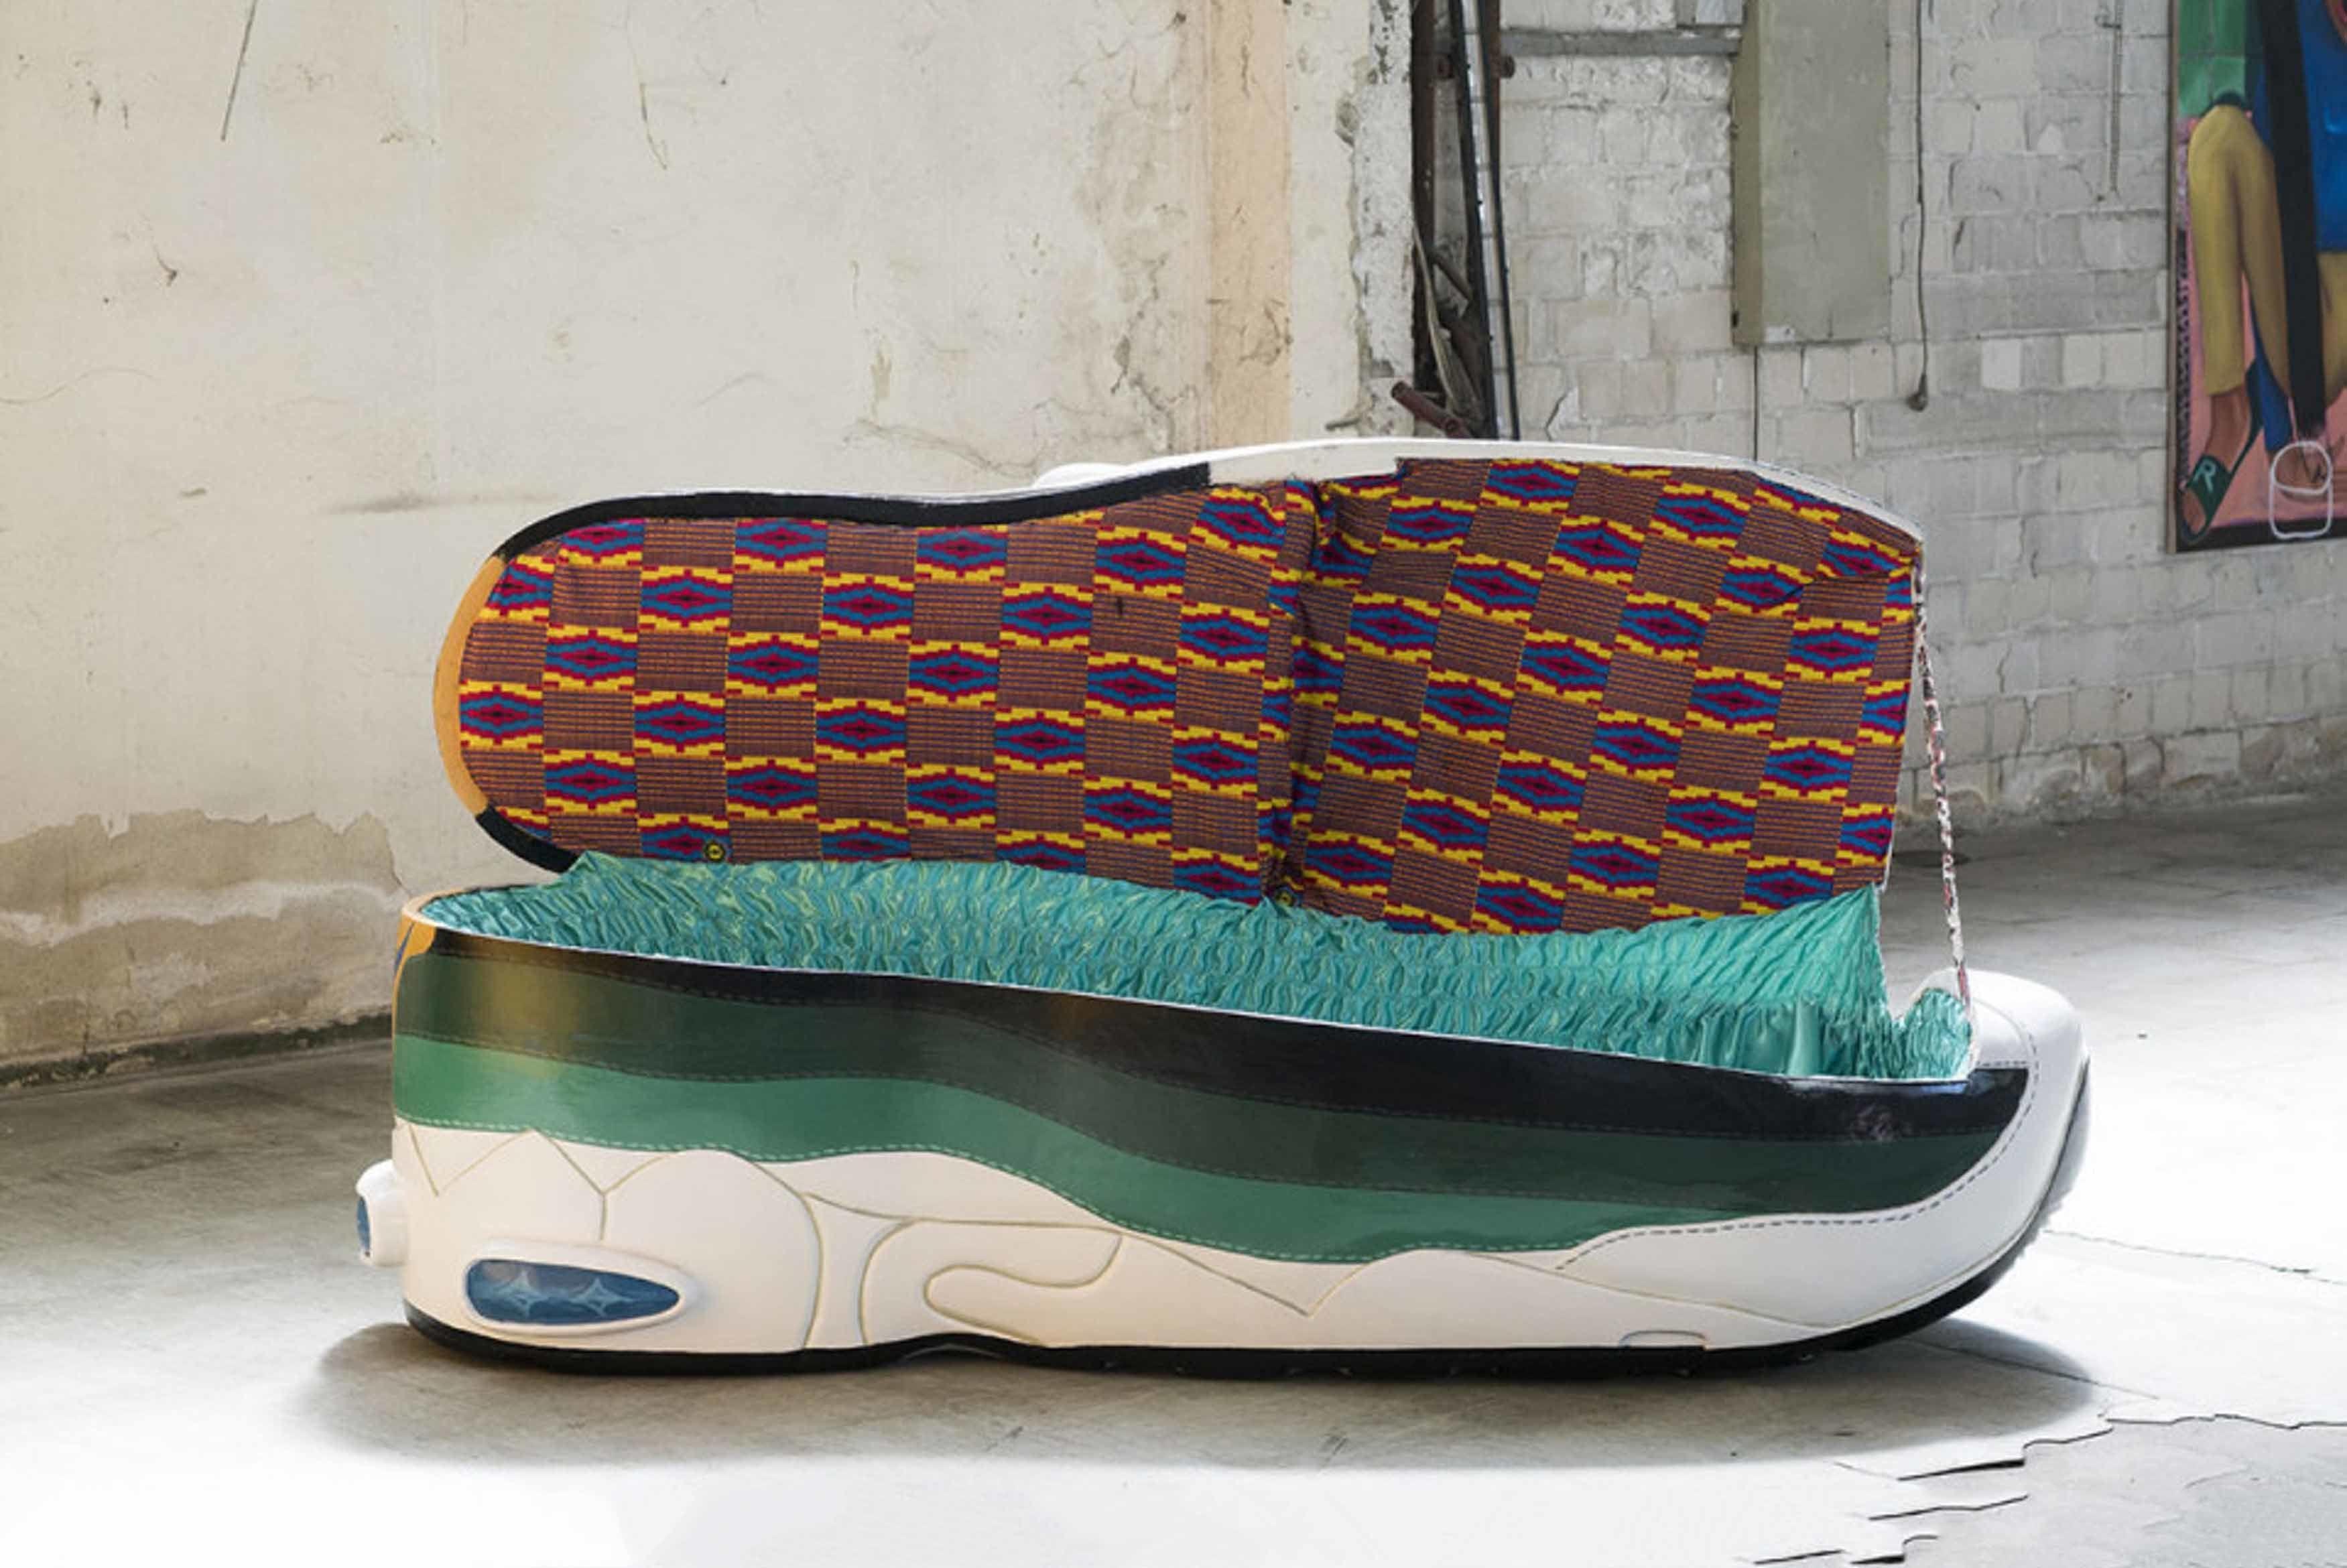 Giant Air Max 95 Coffin Paa Joe 3 Sneaker Freaker